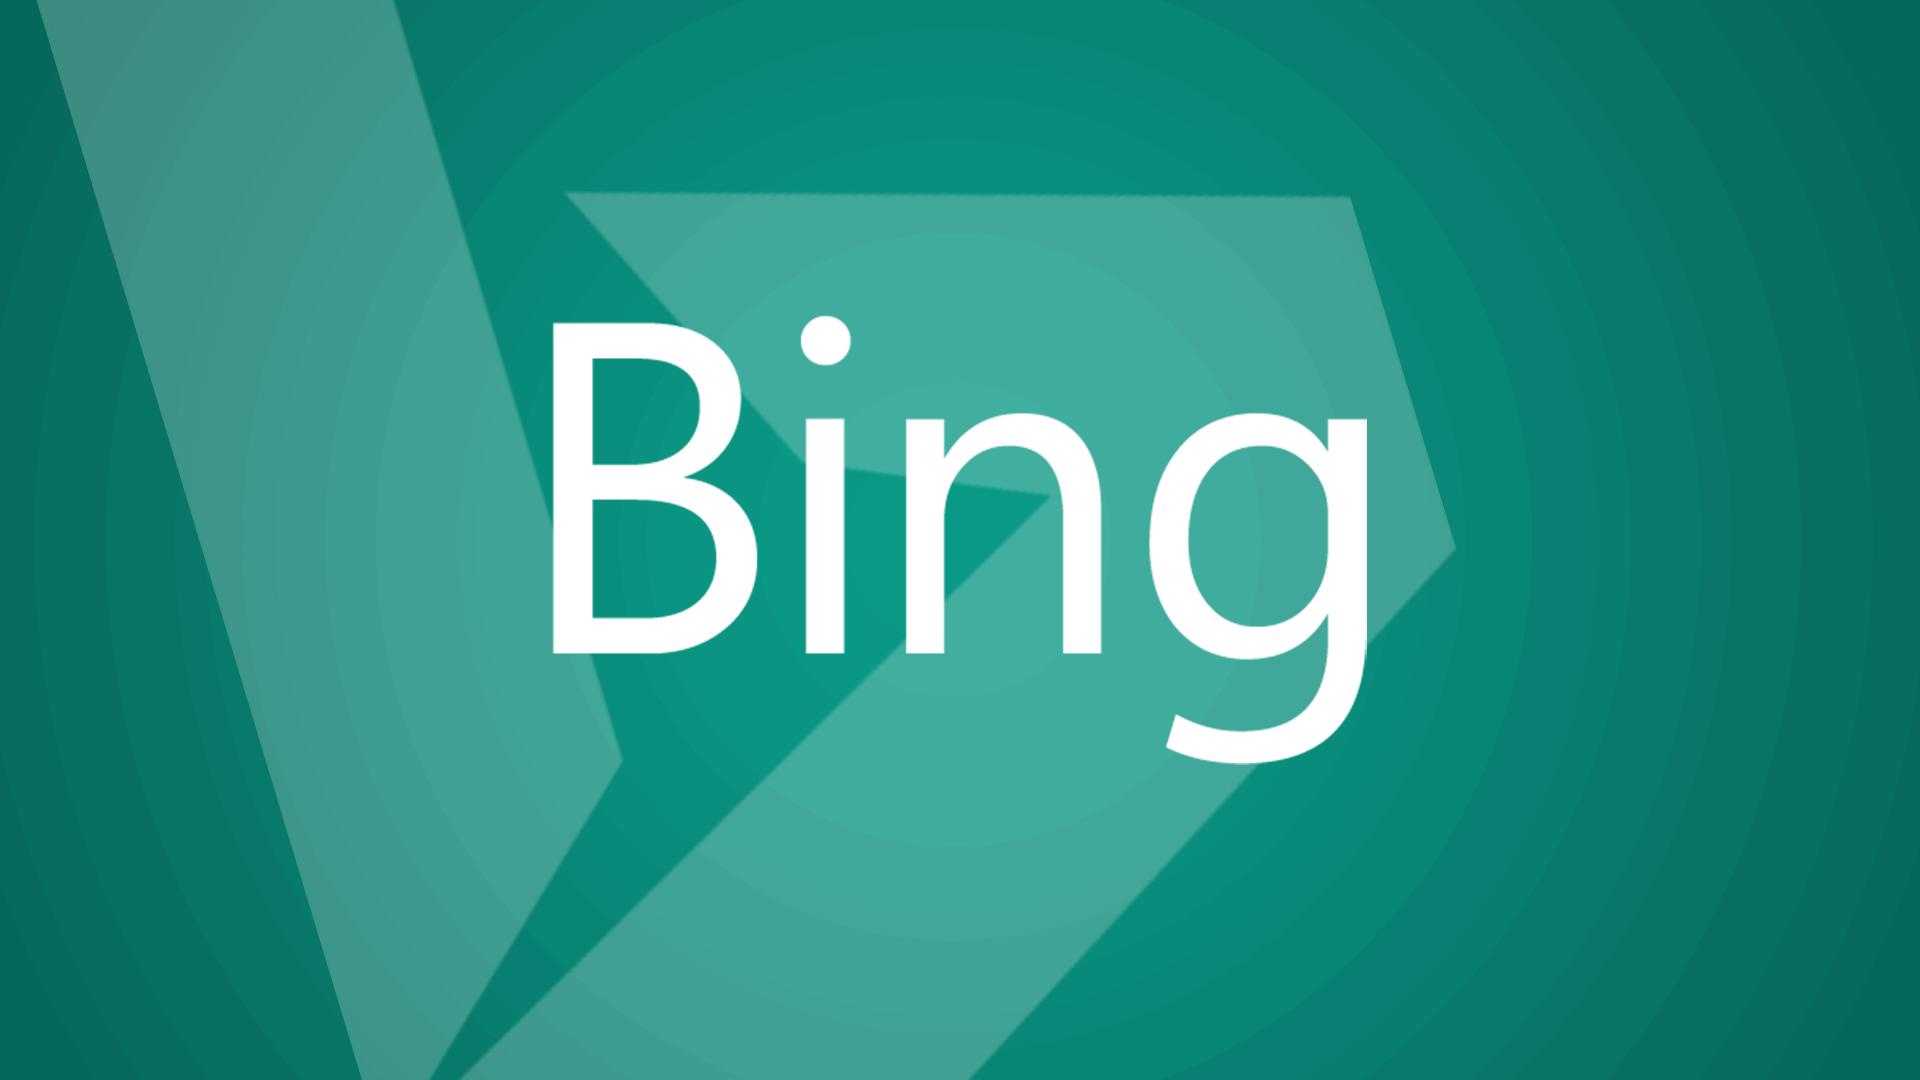 HD Bing Images